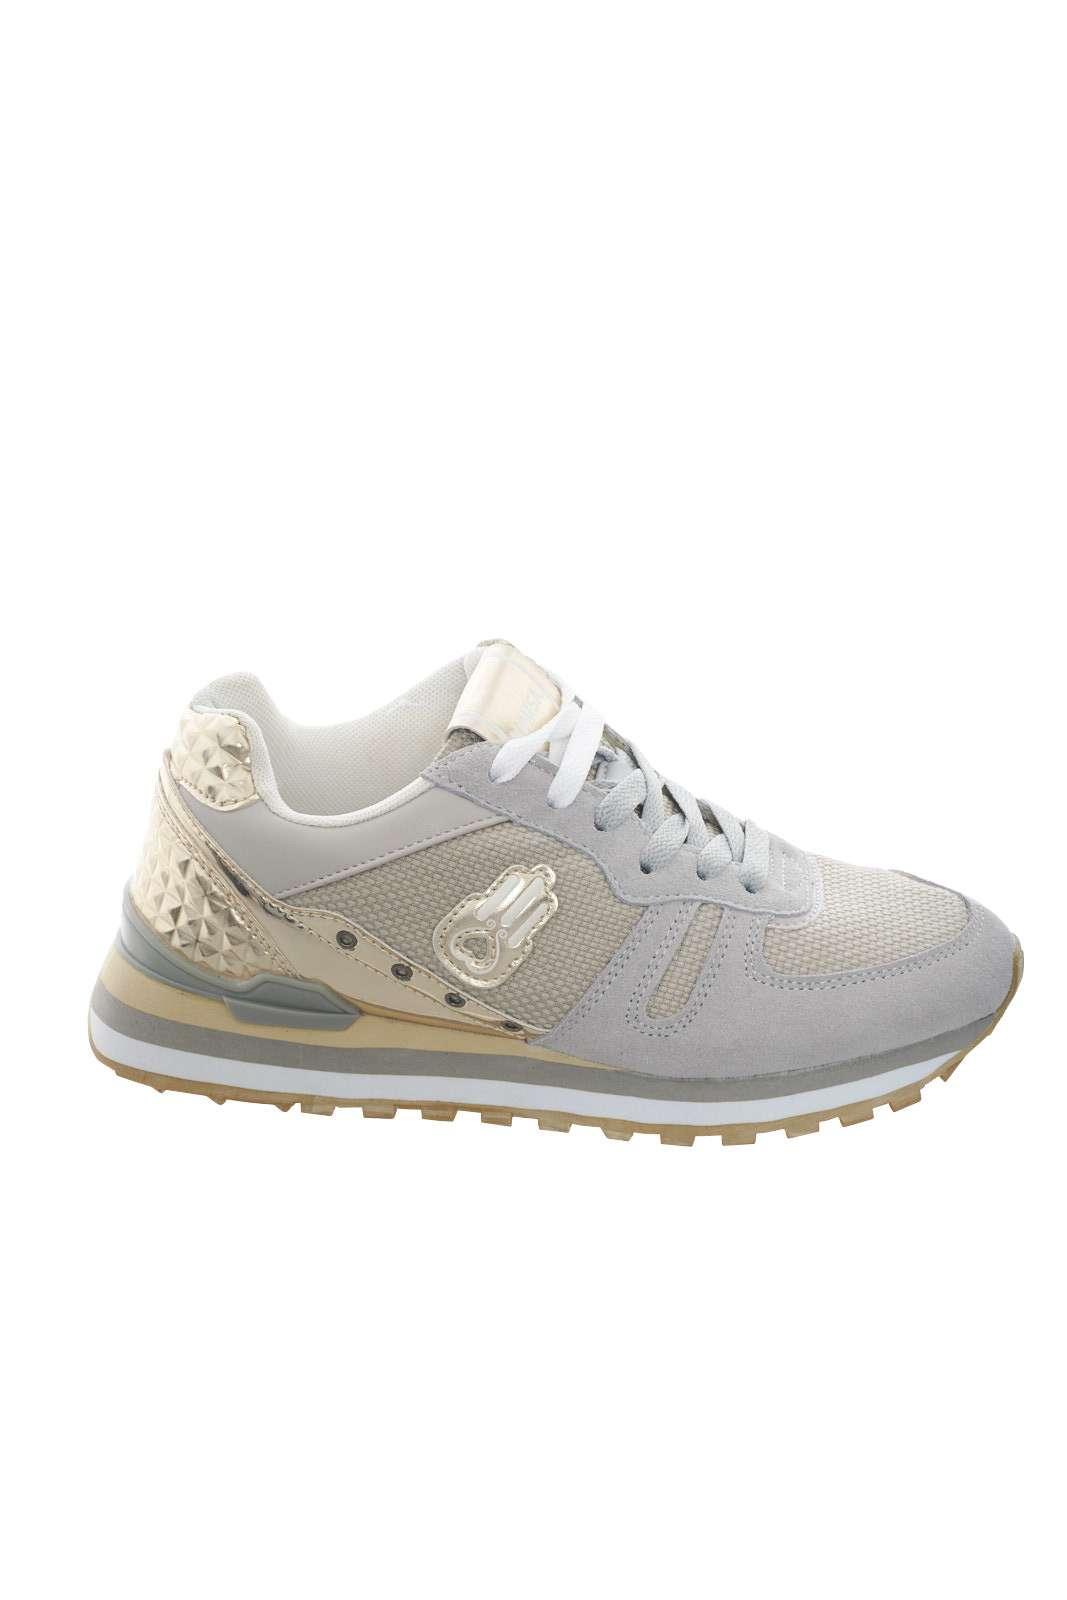 https://www.parmax.com/media/catalog/product/a/i/PE-outlet_parmax-sneaker-donna-Kamsa-KAMSAT-A.jpg